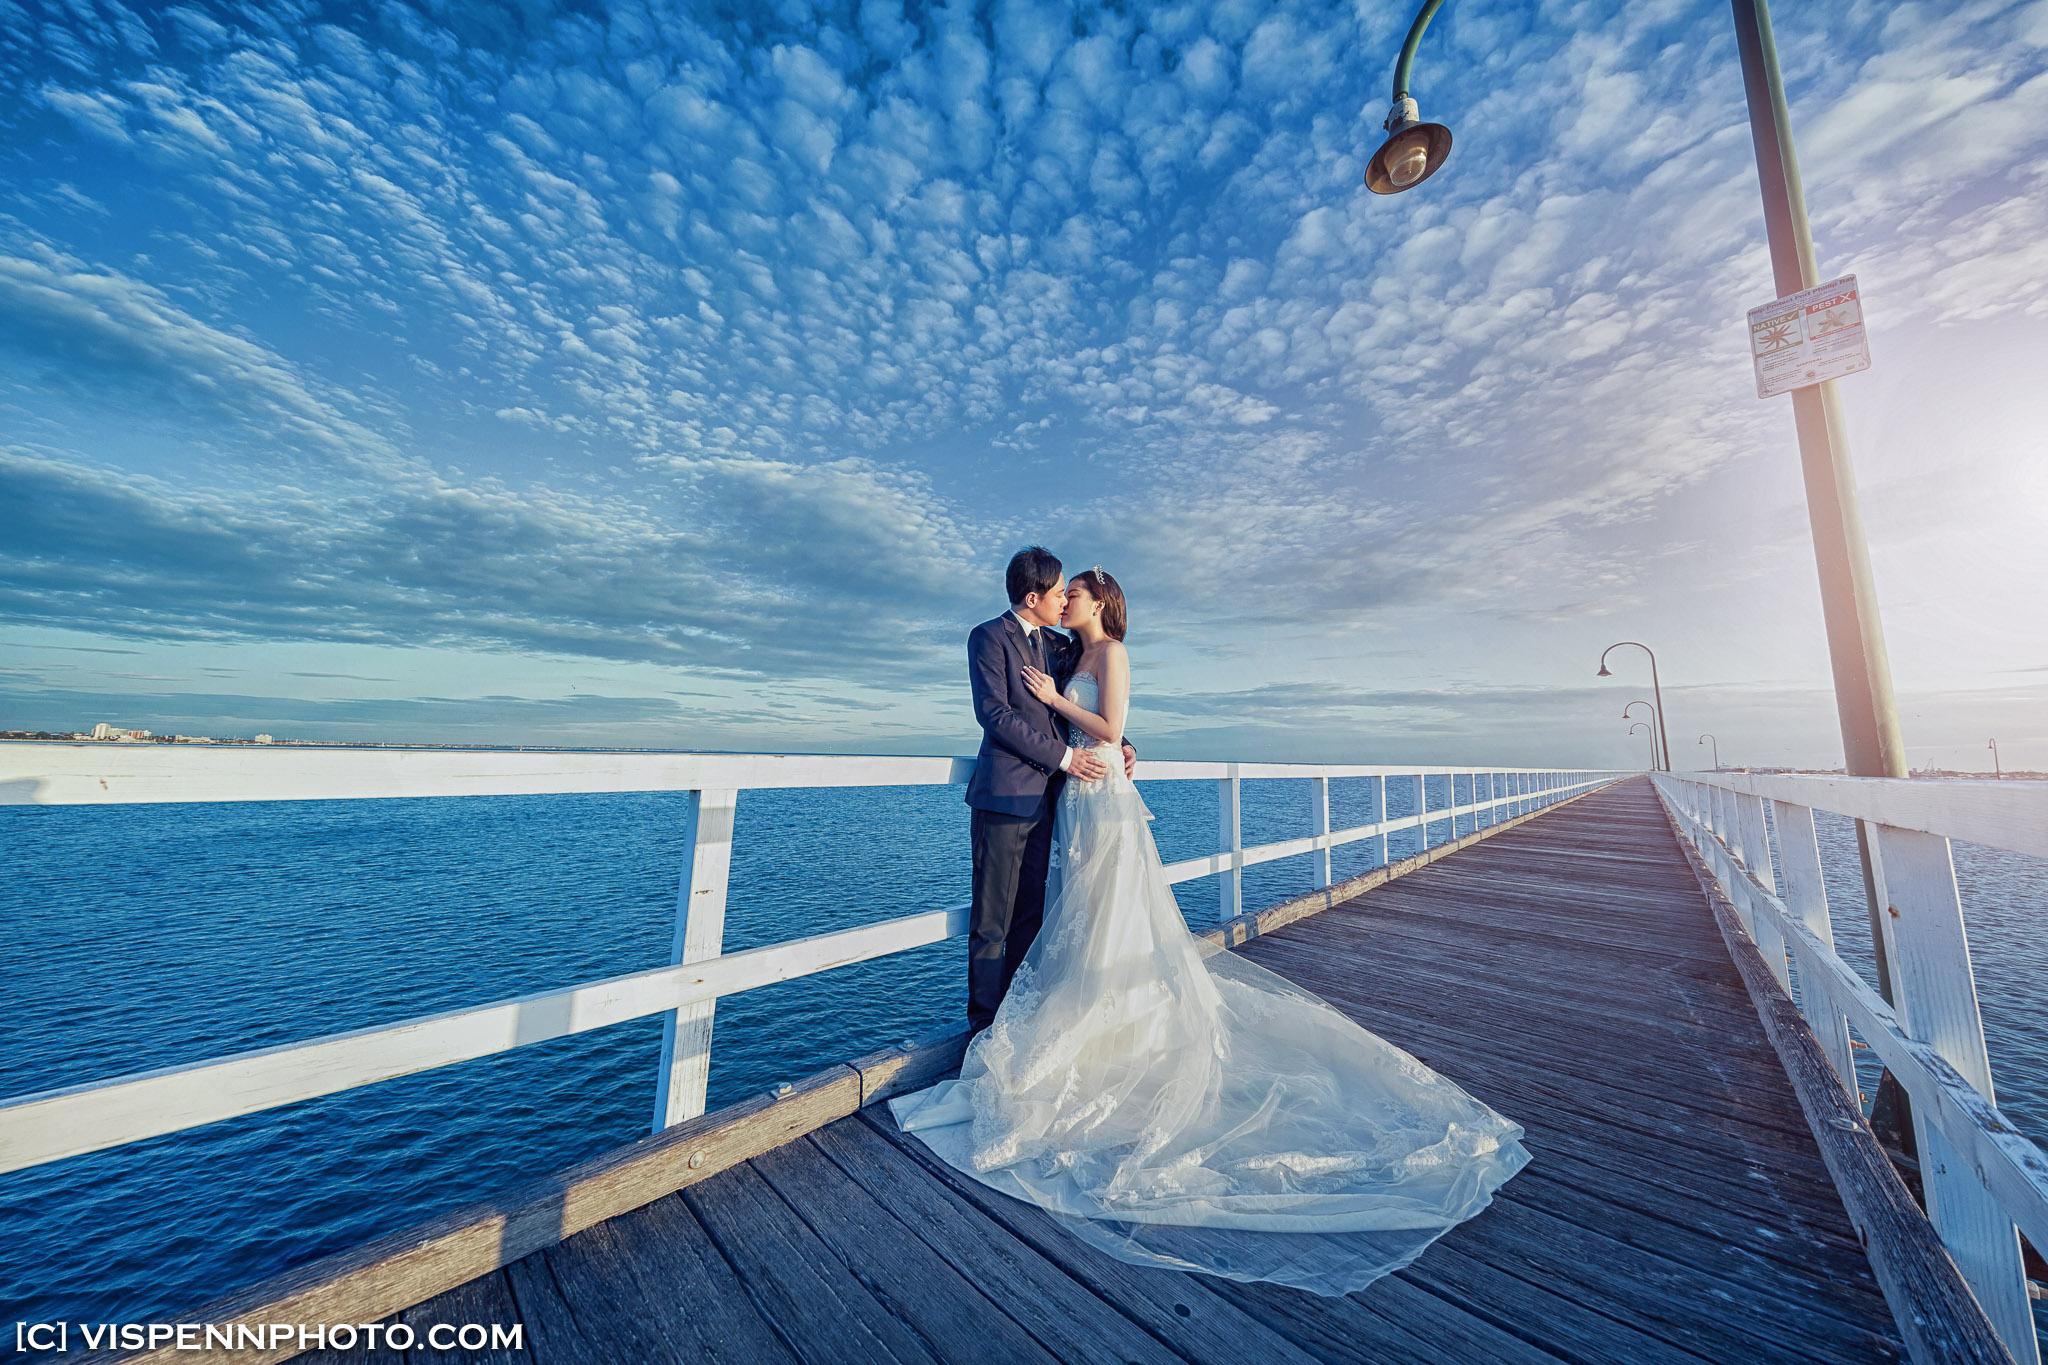 PRE WEDDING Photography Melbourne ZHPENN JackySerena 2214 1 1